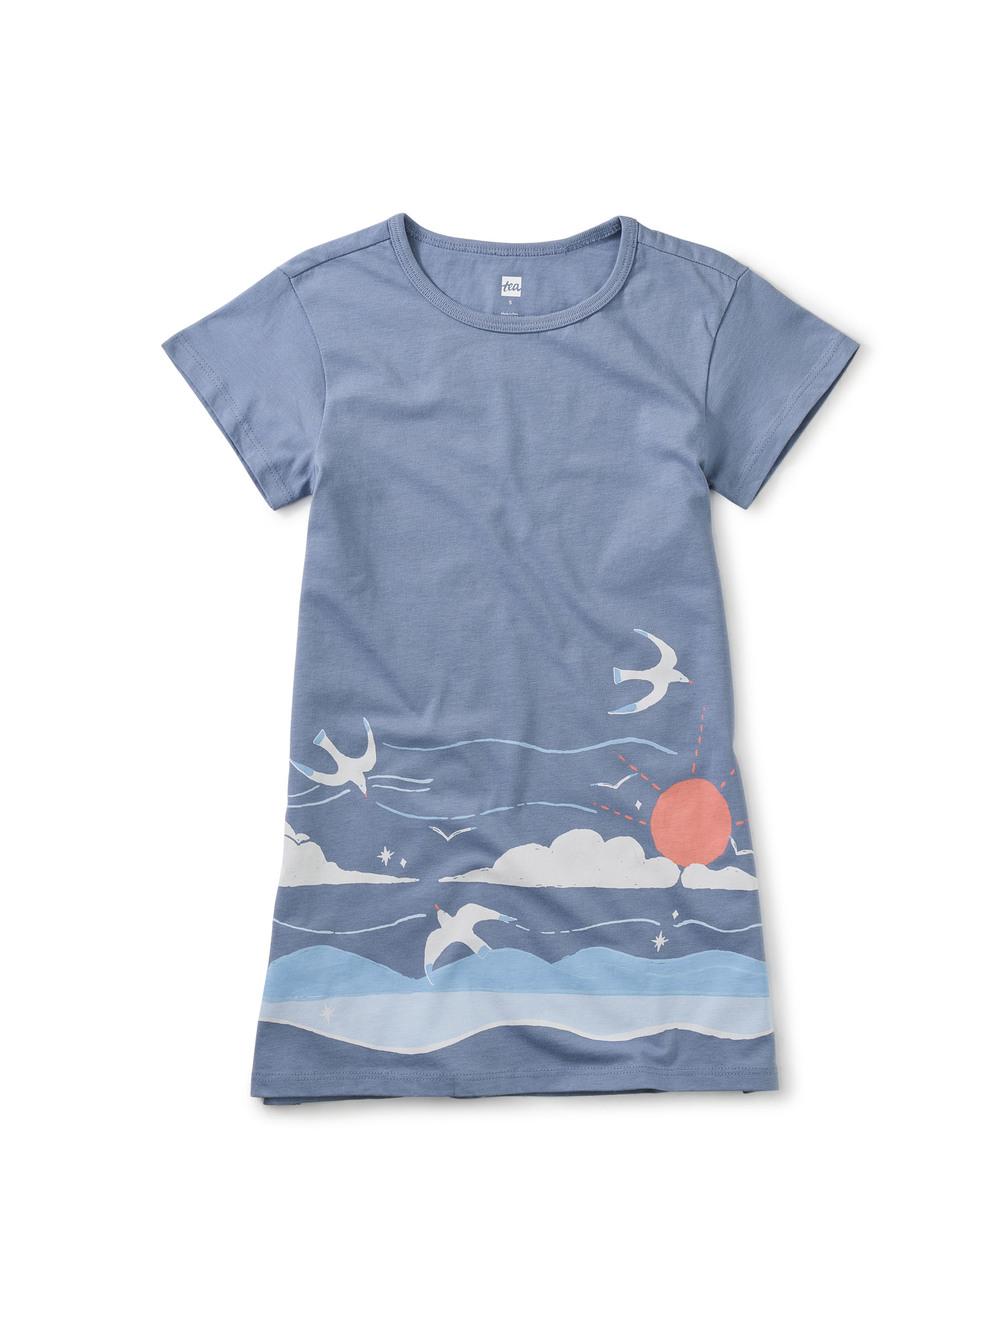 New Waves Border T-Shirt Dress